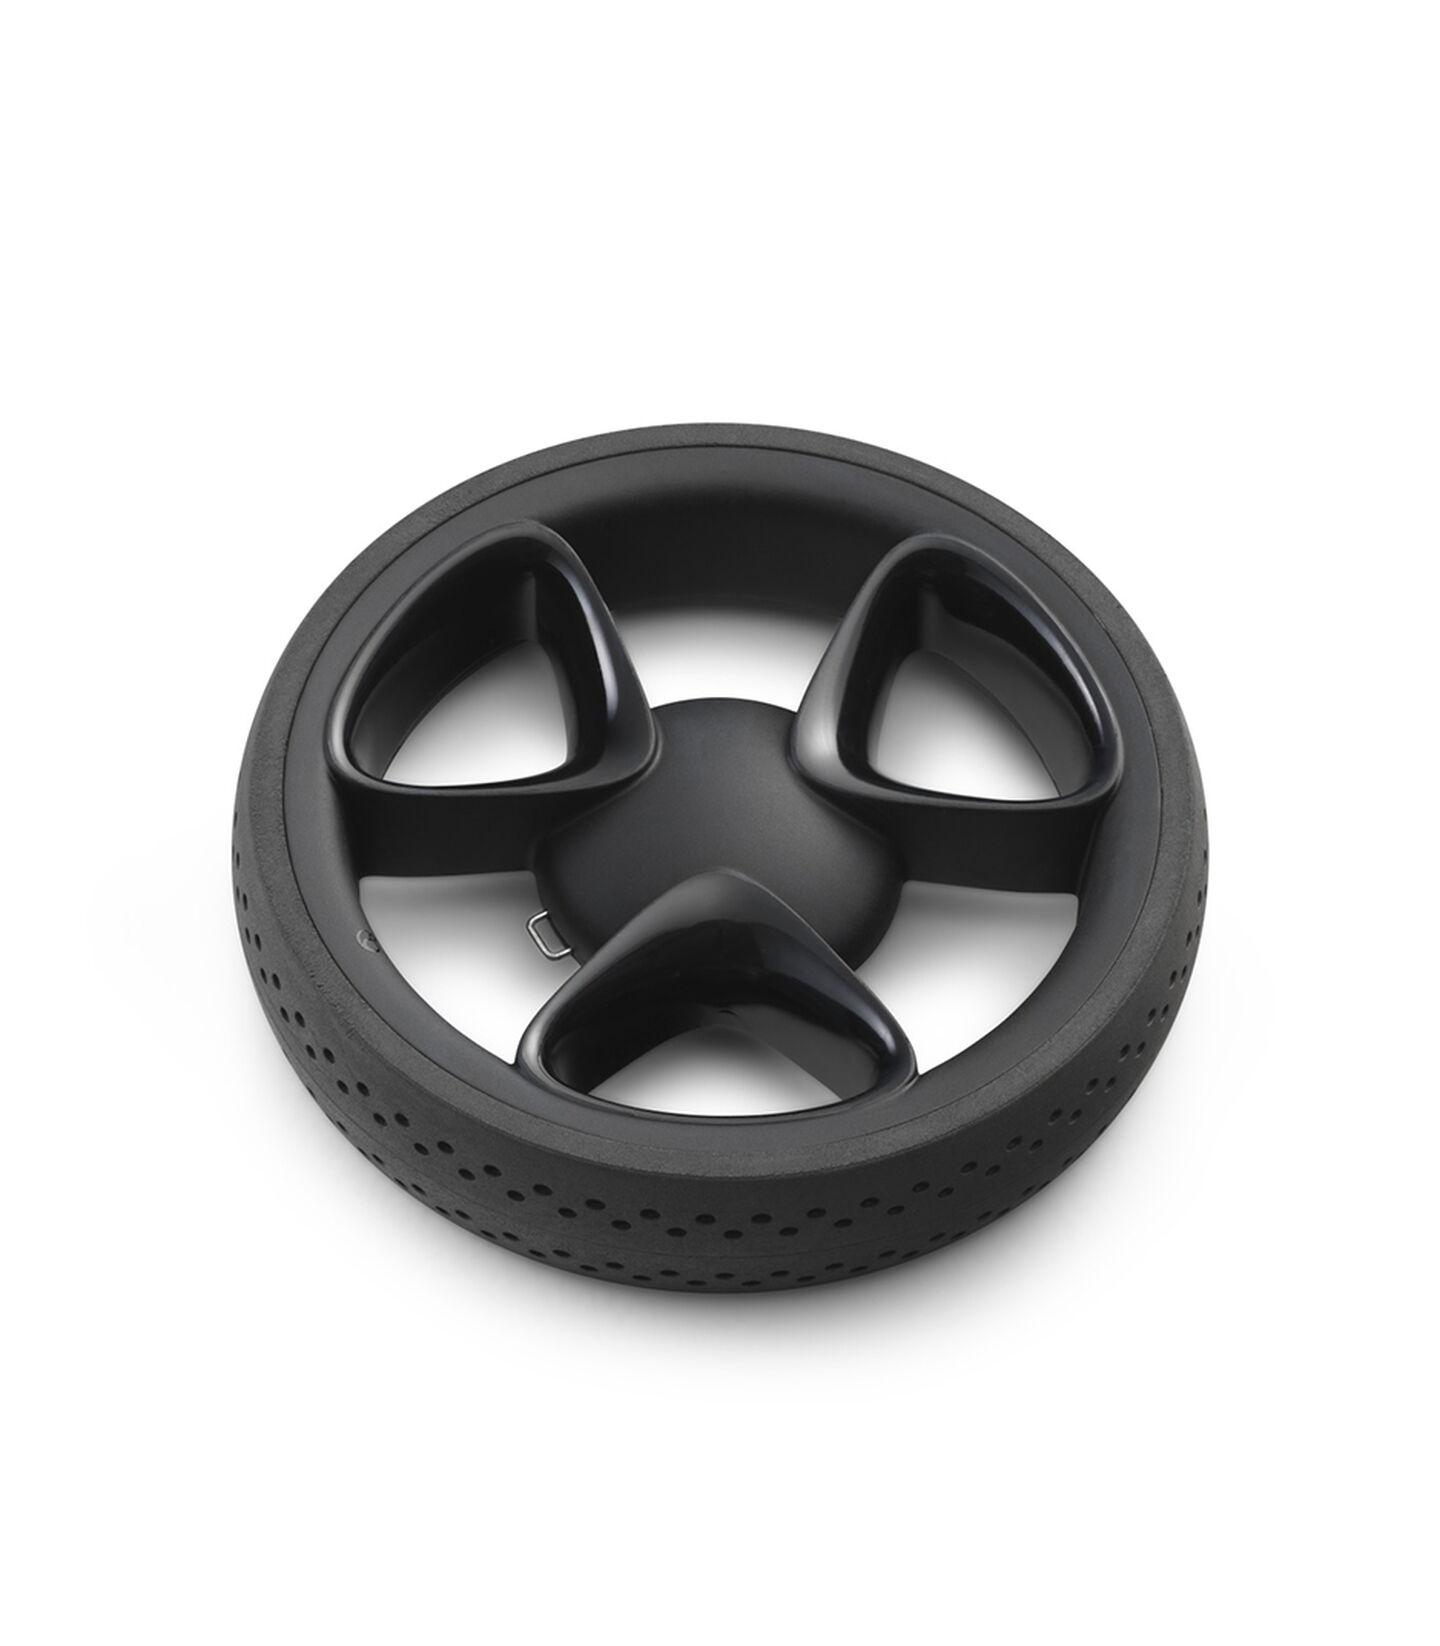 Stokke® Xplory® Back wheel complete Black, Noir, mainview view 1